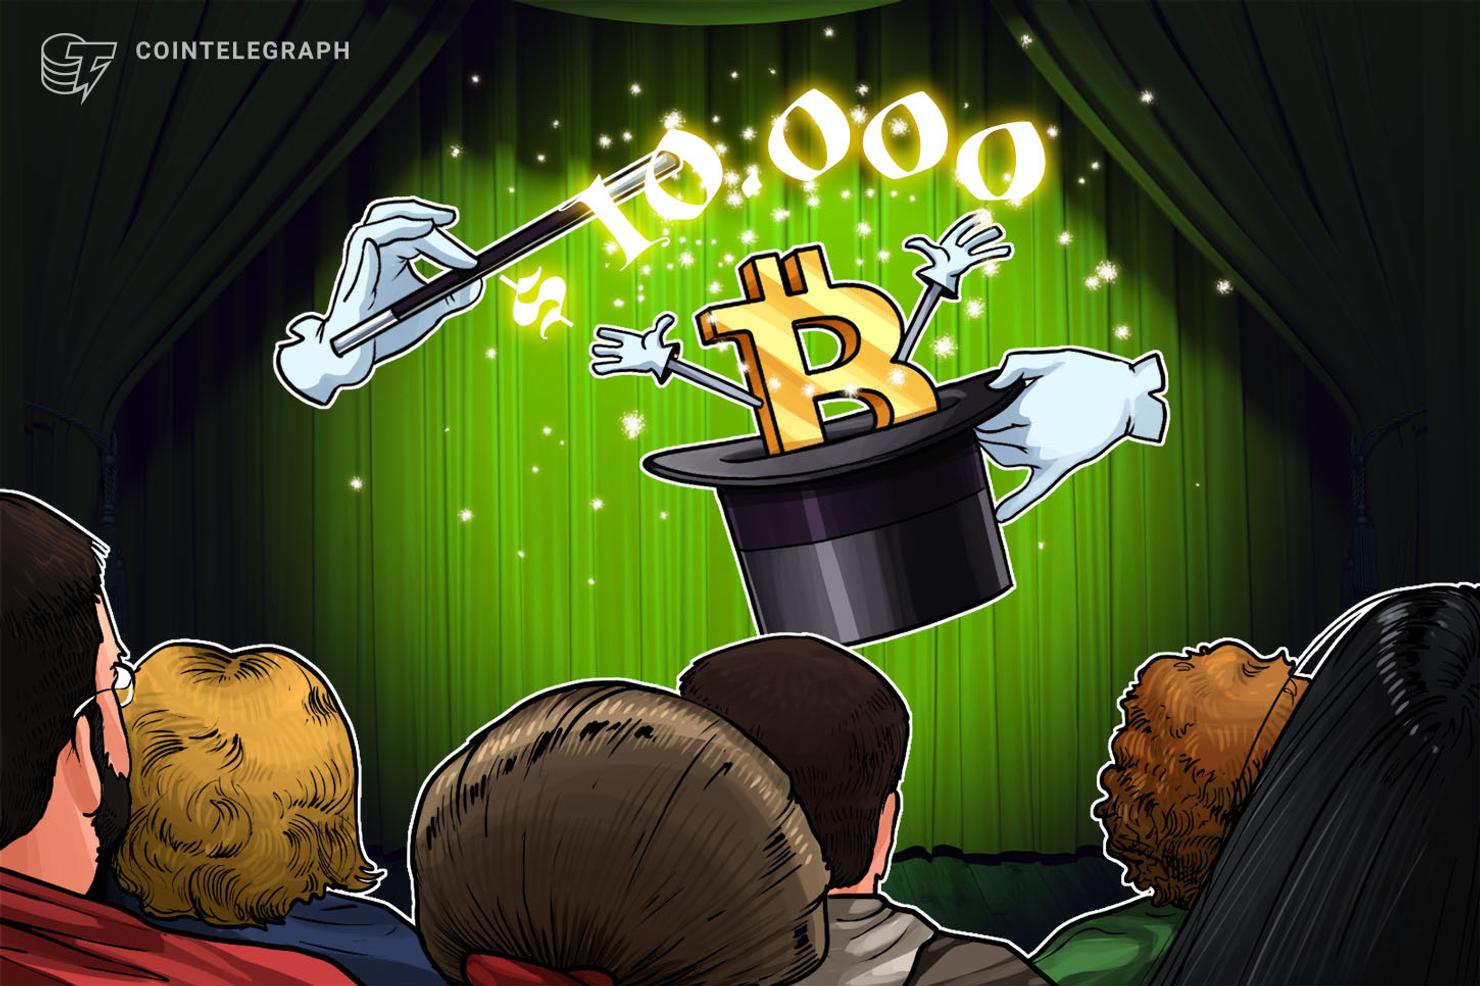 After Sudden Slump Last Week, Bitcoin Breaks $10,000 Again